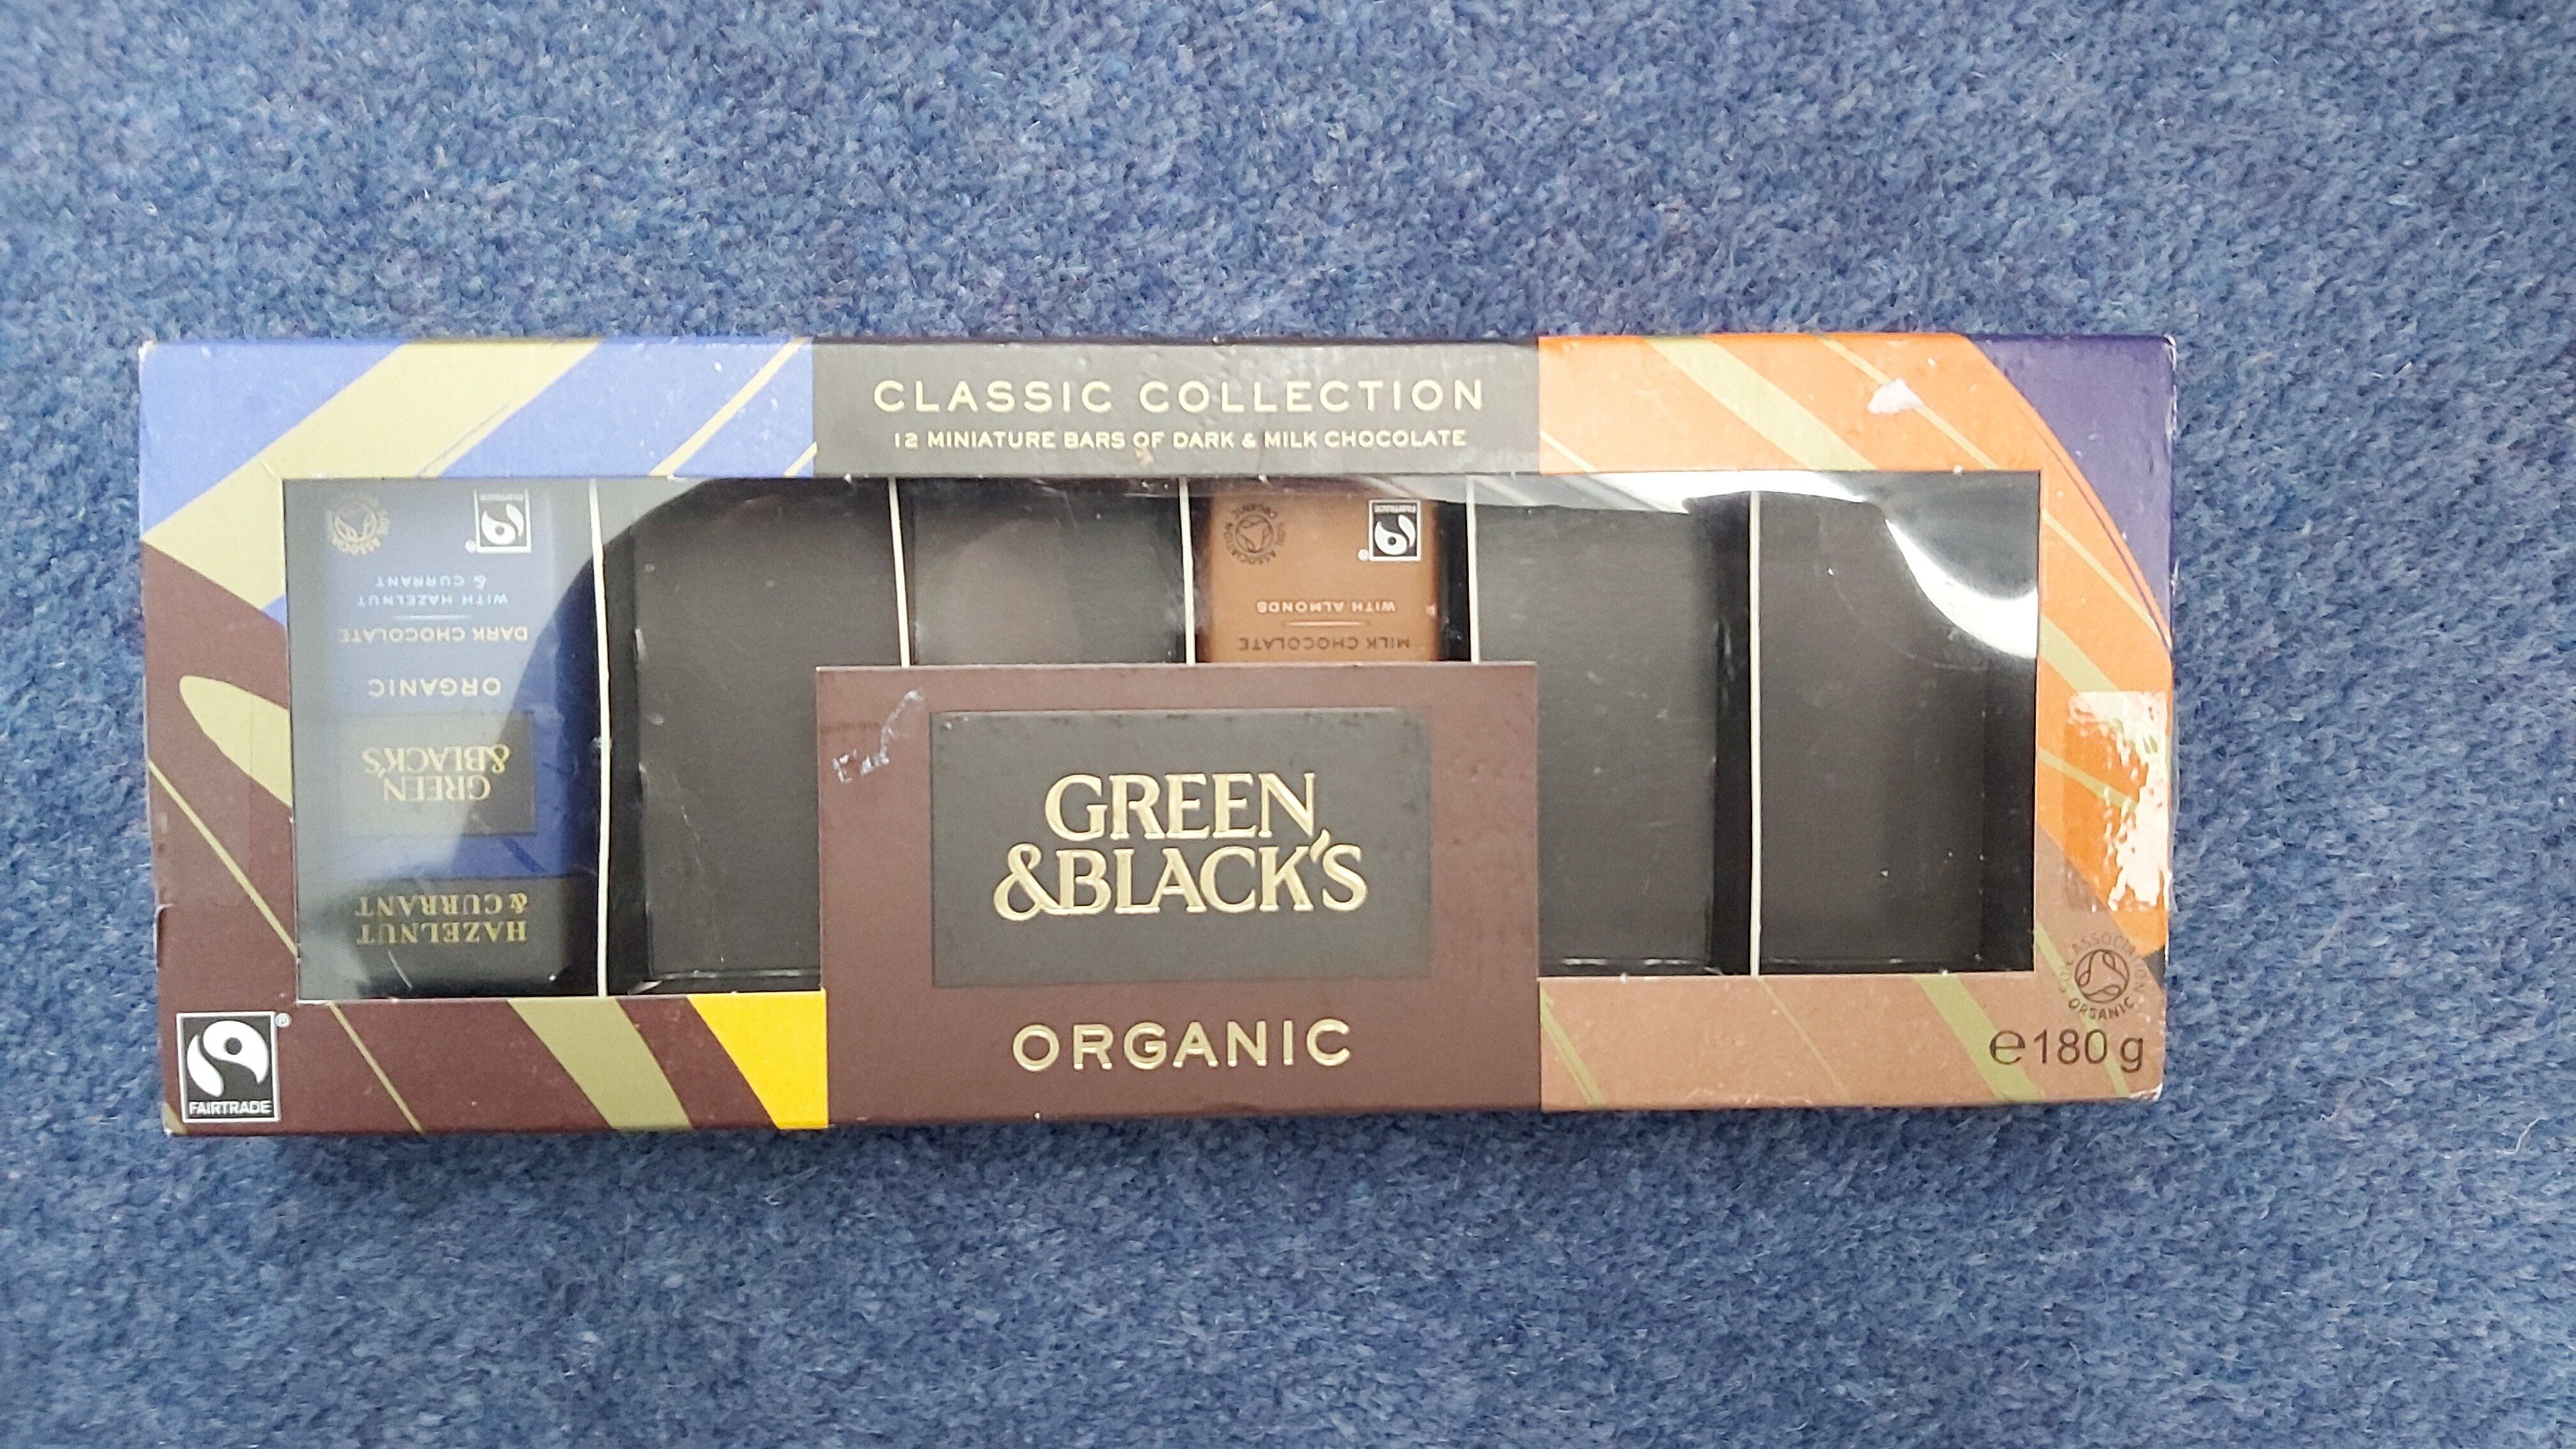 Black's Organic Classic Miniature Chocolate Bar Collection - Product - en